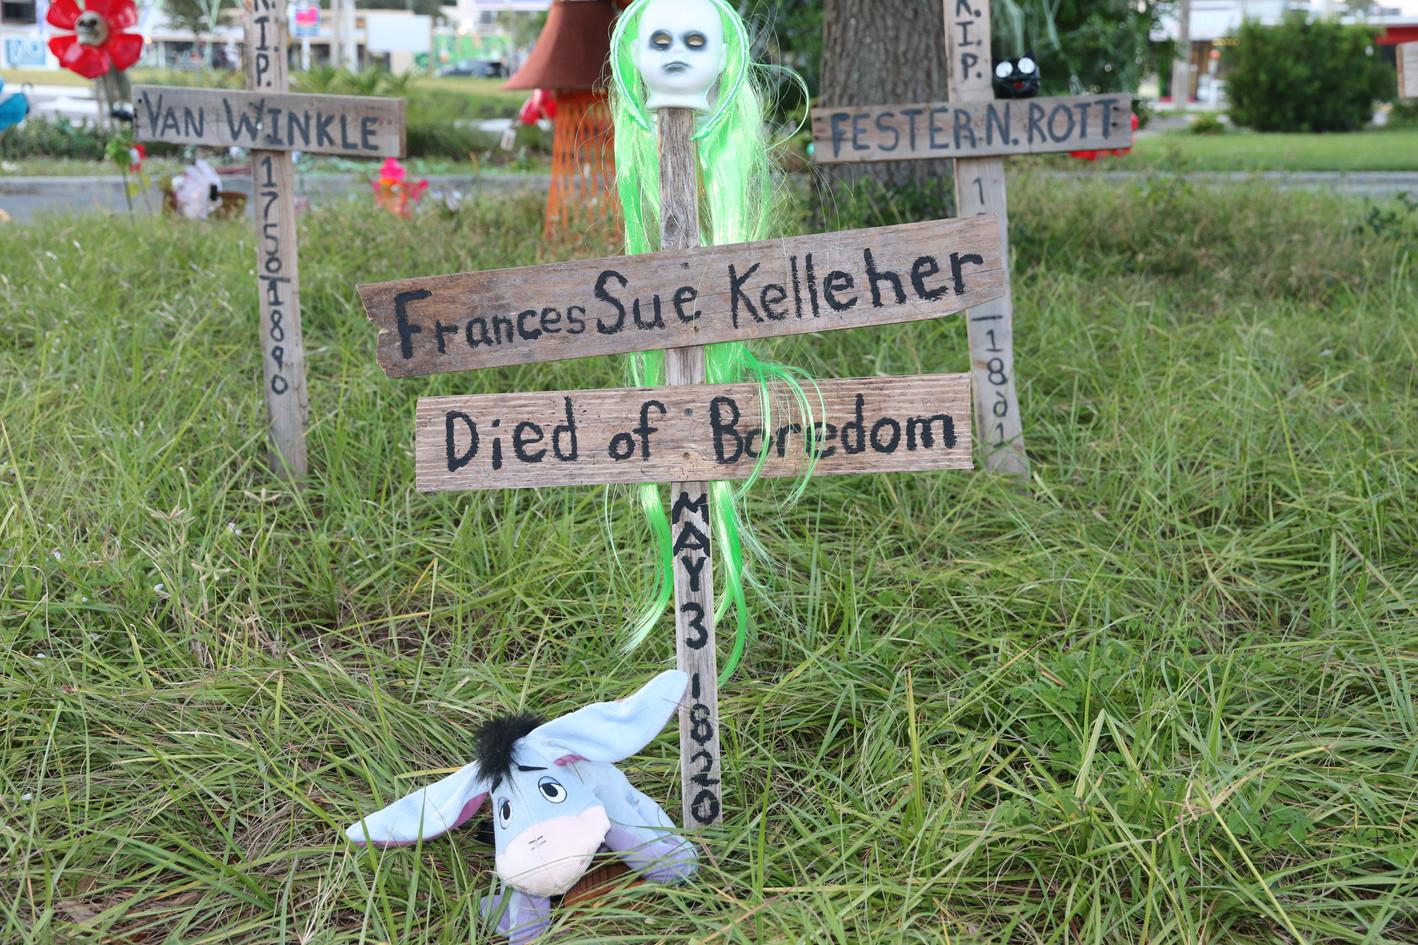 Frances Sue Kelleher